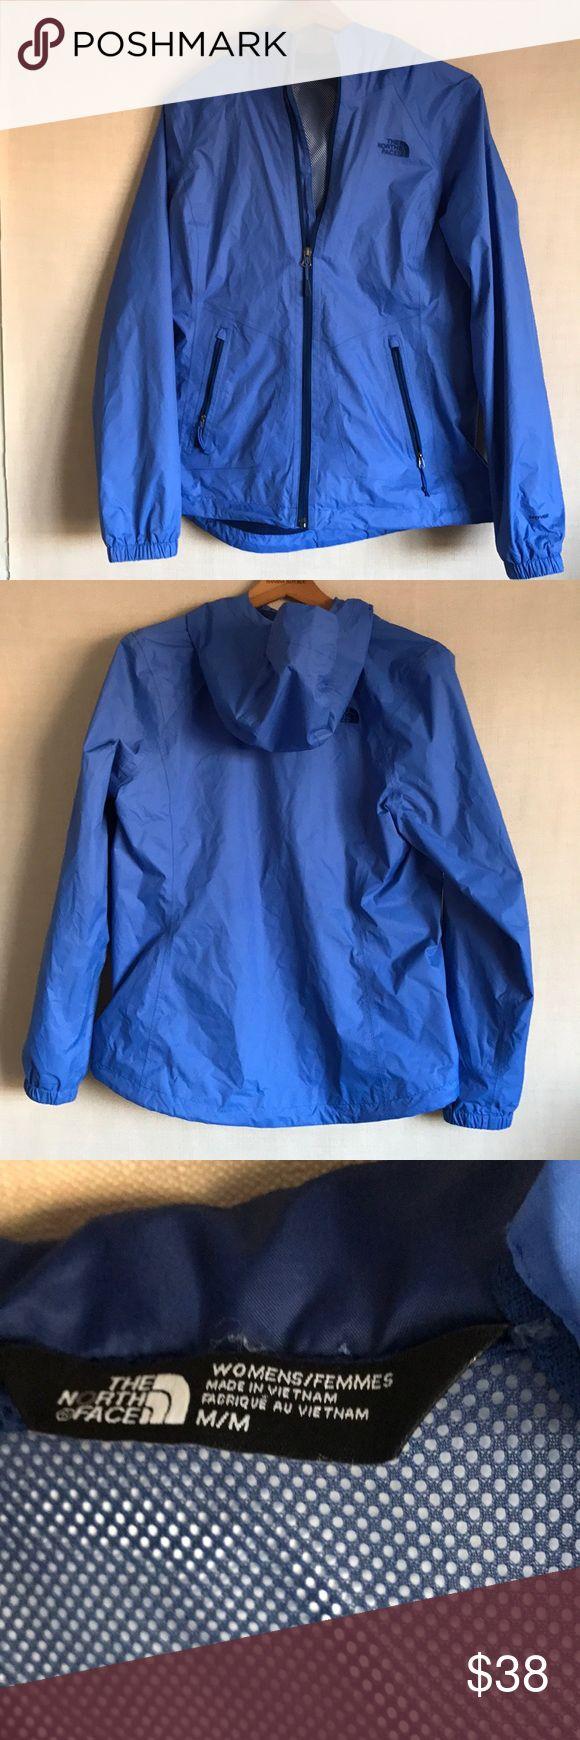 North face rain jacket vietnam